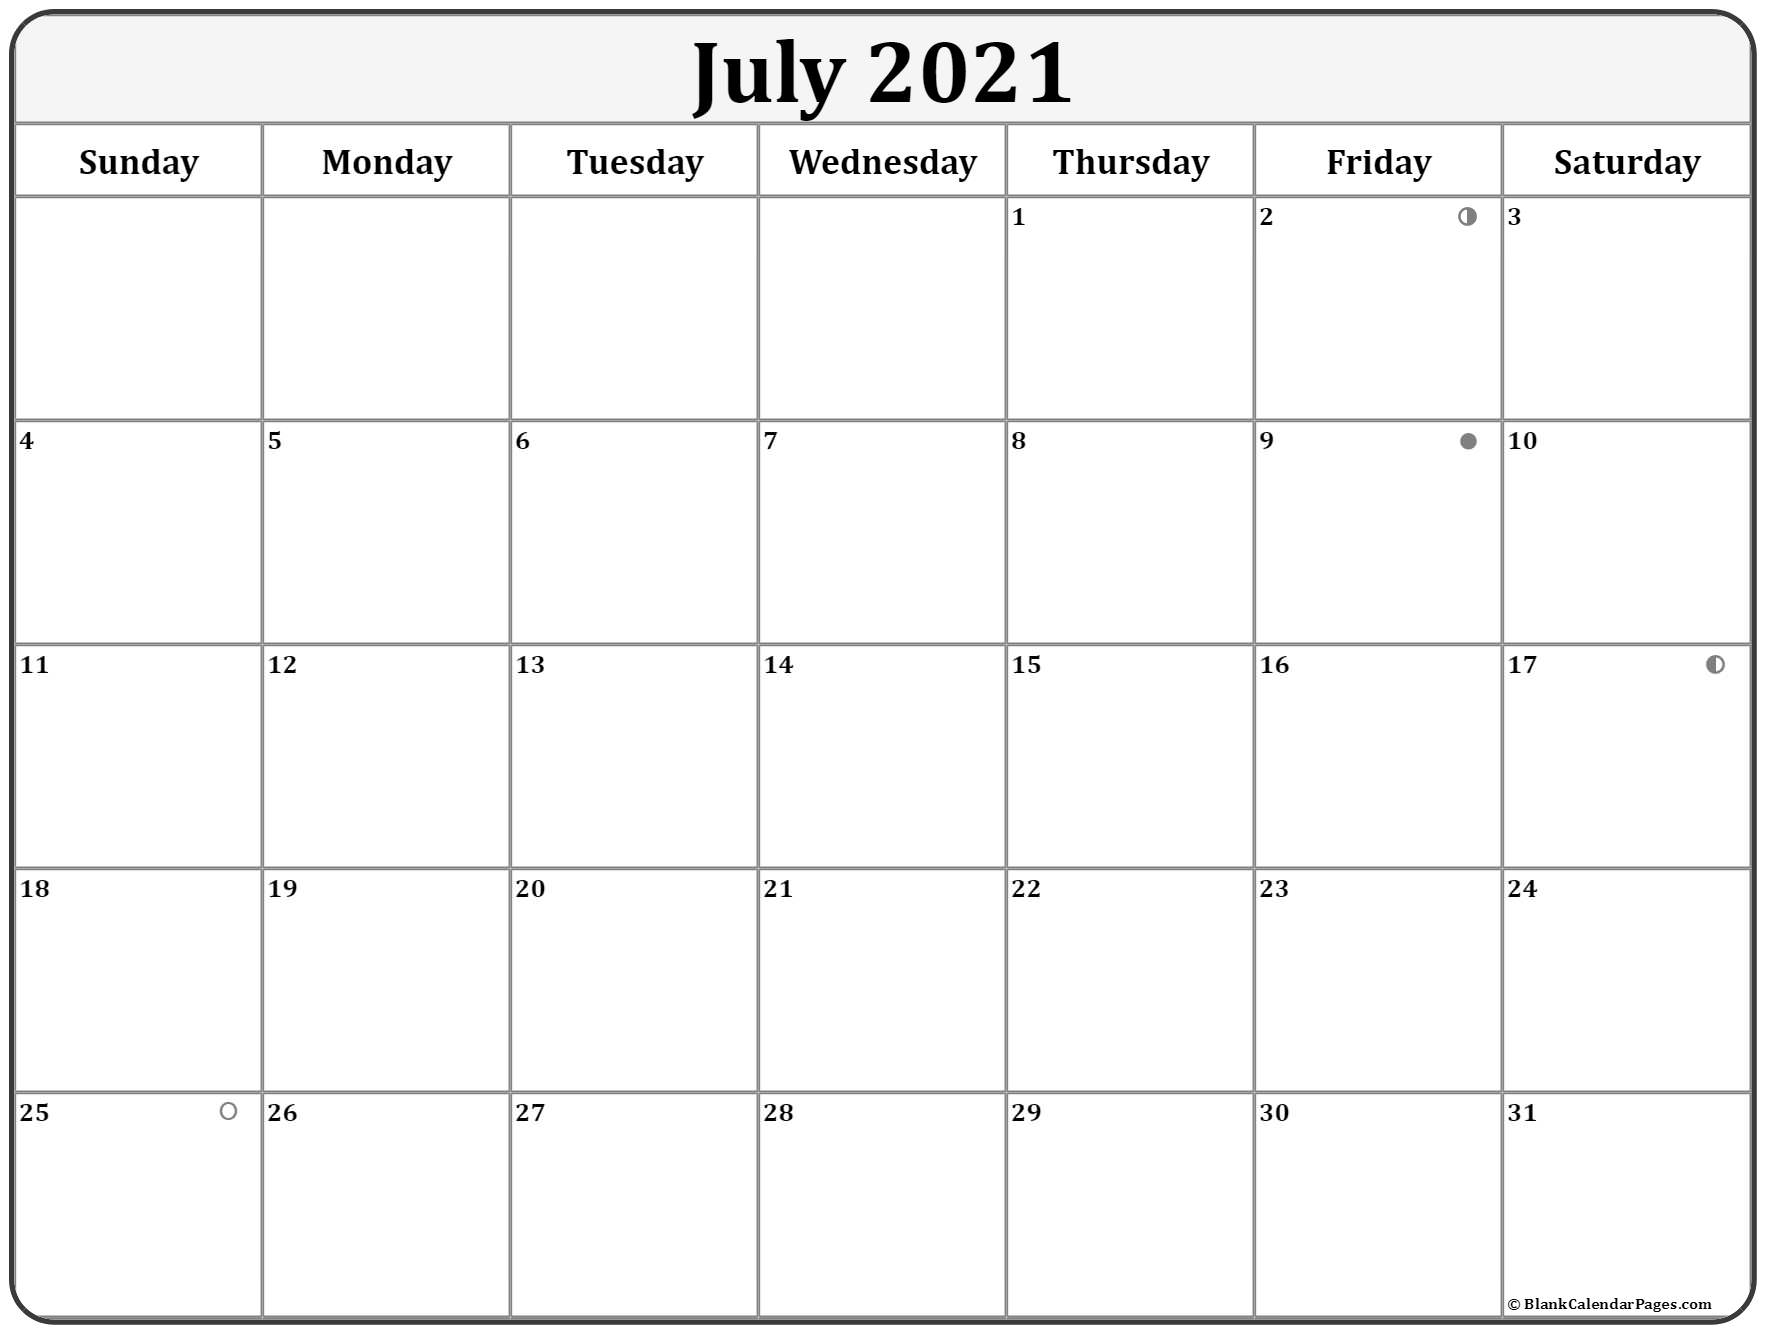 July 2021 Lunar Calendar | Moon Phase Calendar Throughout 2021 Deer Hunting Lunar Calendar